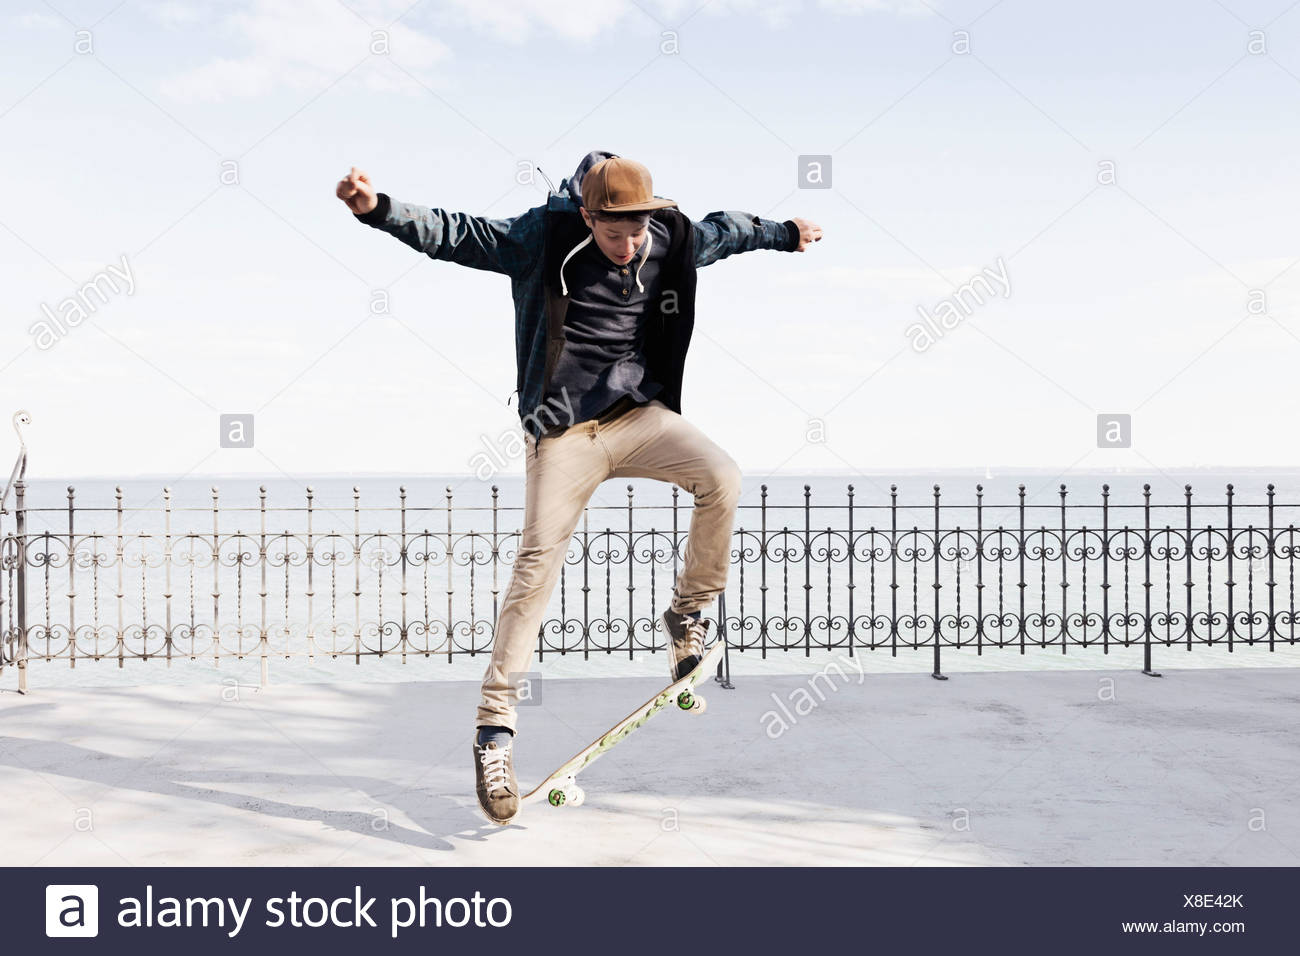 Germany, Schleswig Holstein, Teenage boy jumping with skateboard - Stock Image